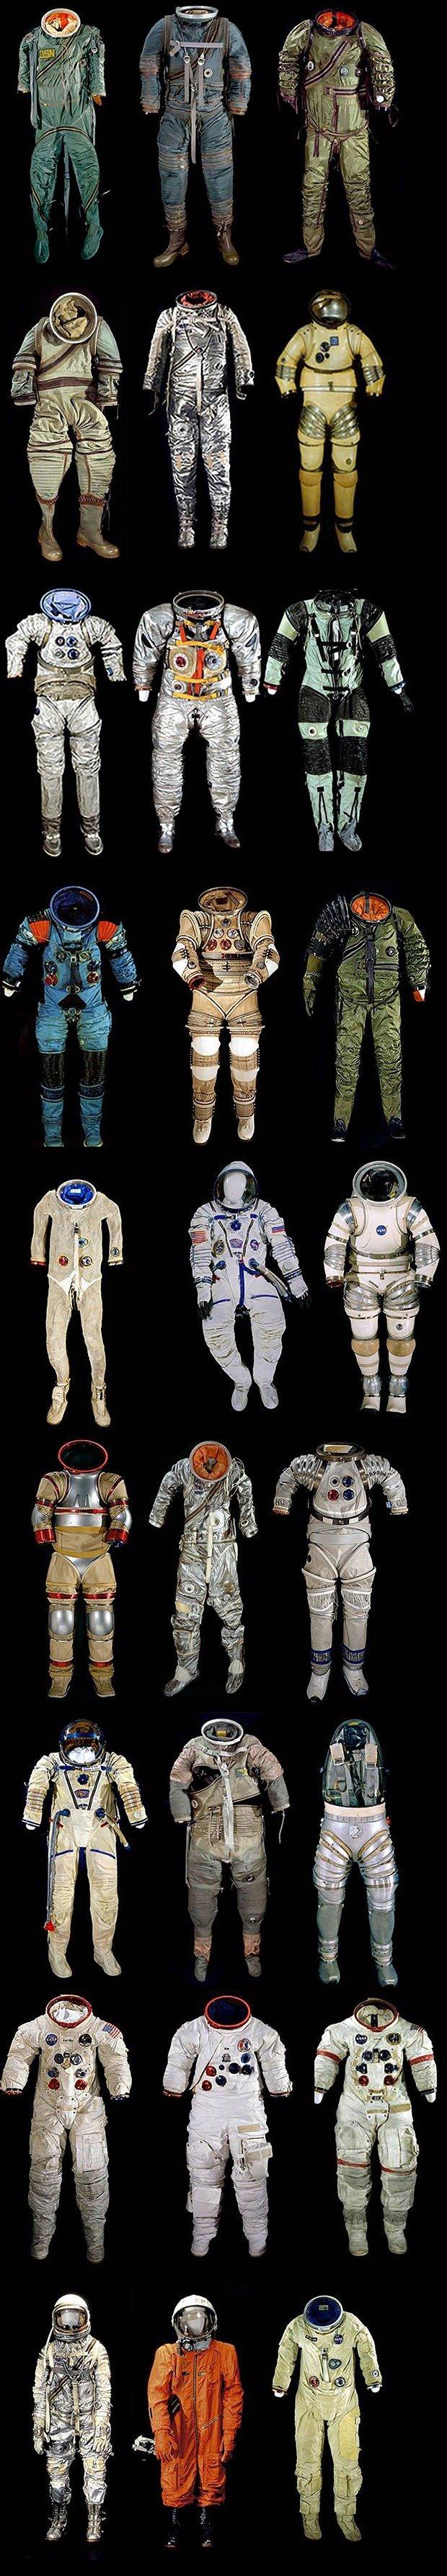 14. SpaceSuits